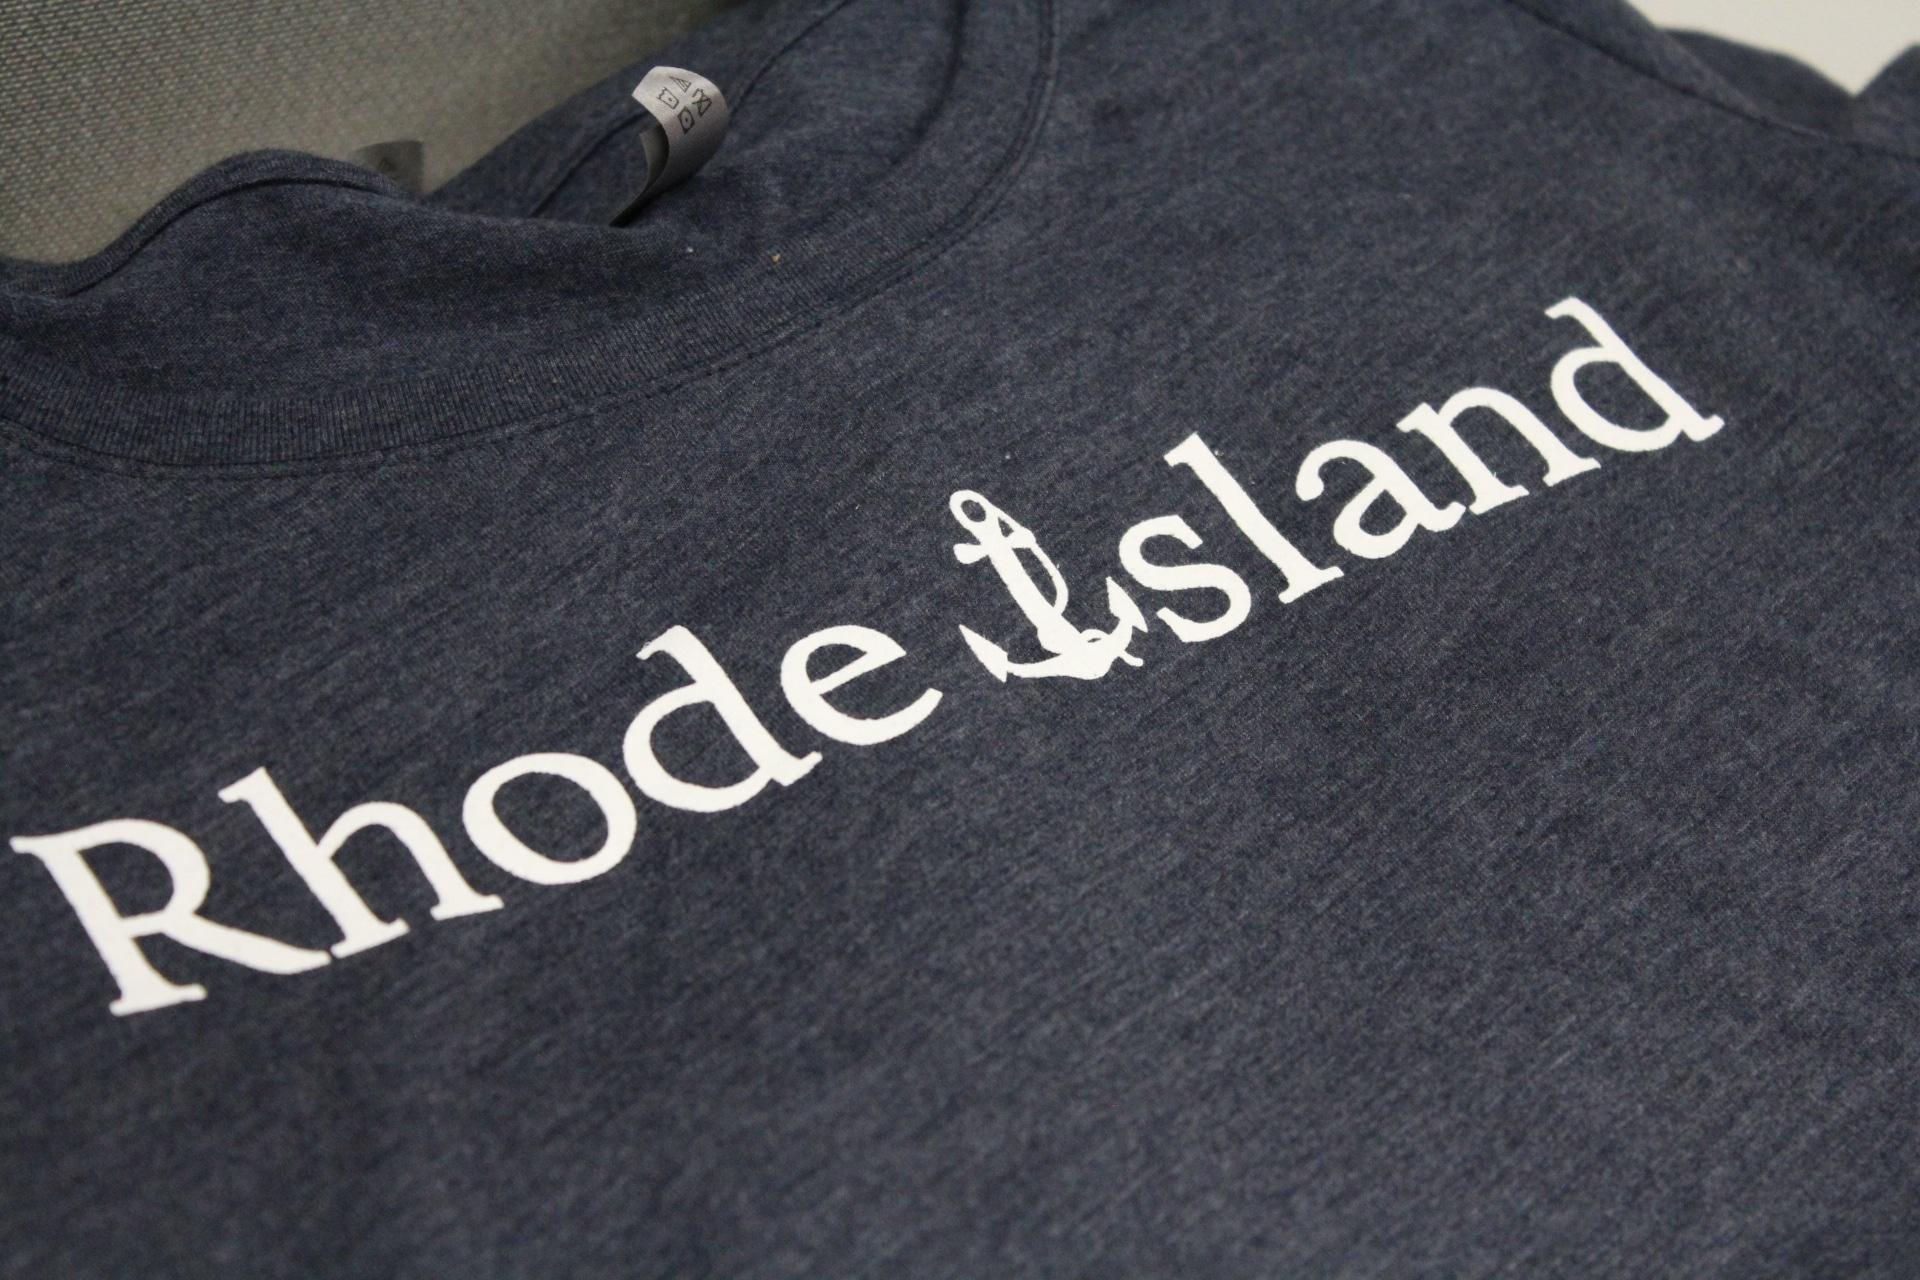 RHODE ISLAND APPAREL